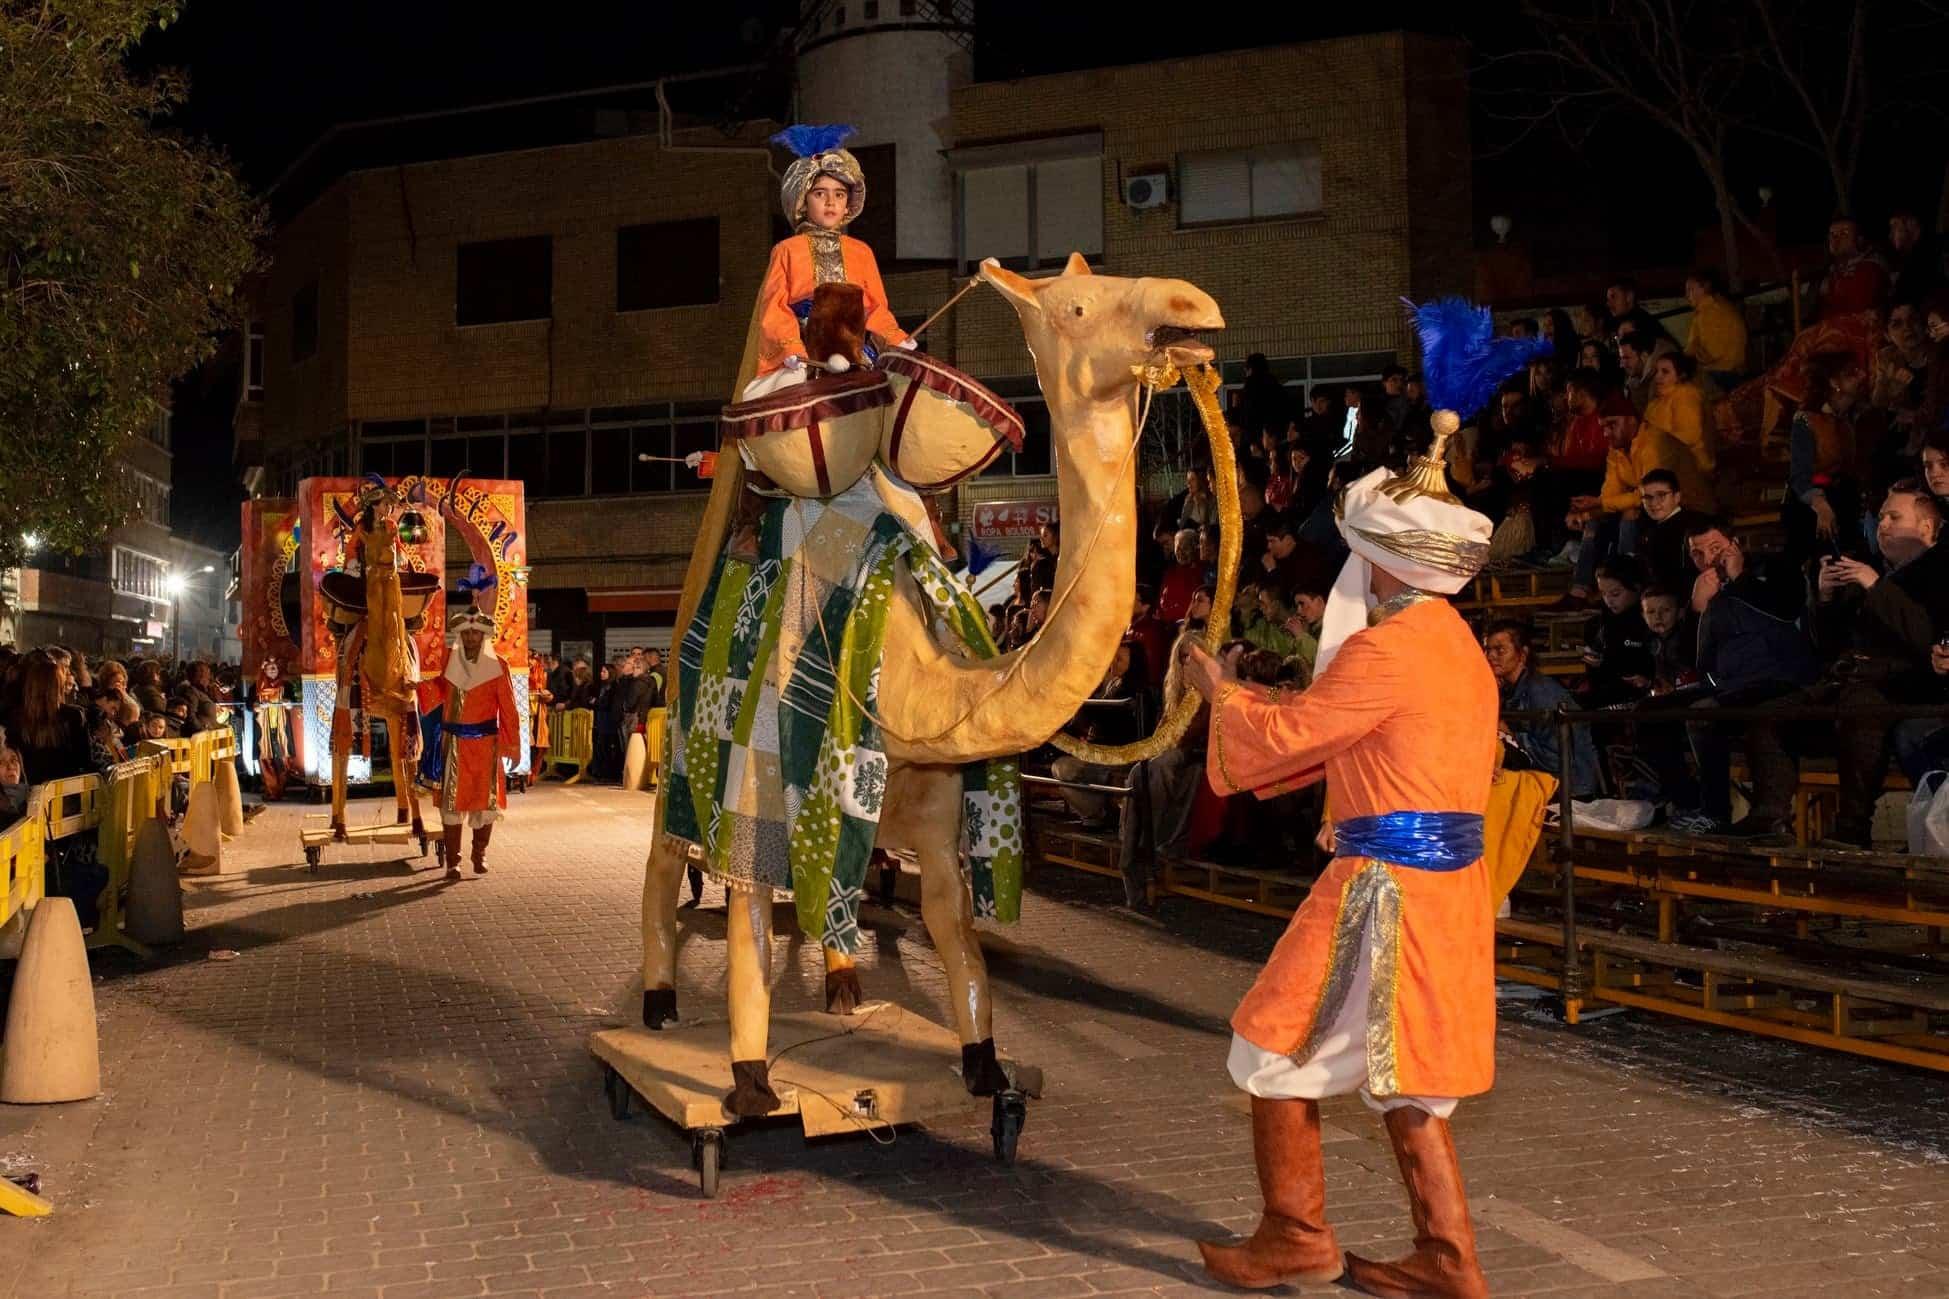 Carnaval de herencia 2020 ofertorio 131 - Selección de fotografías del Ofertorio del Carnaval de Herencia